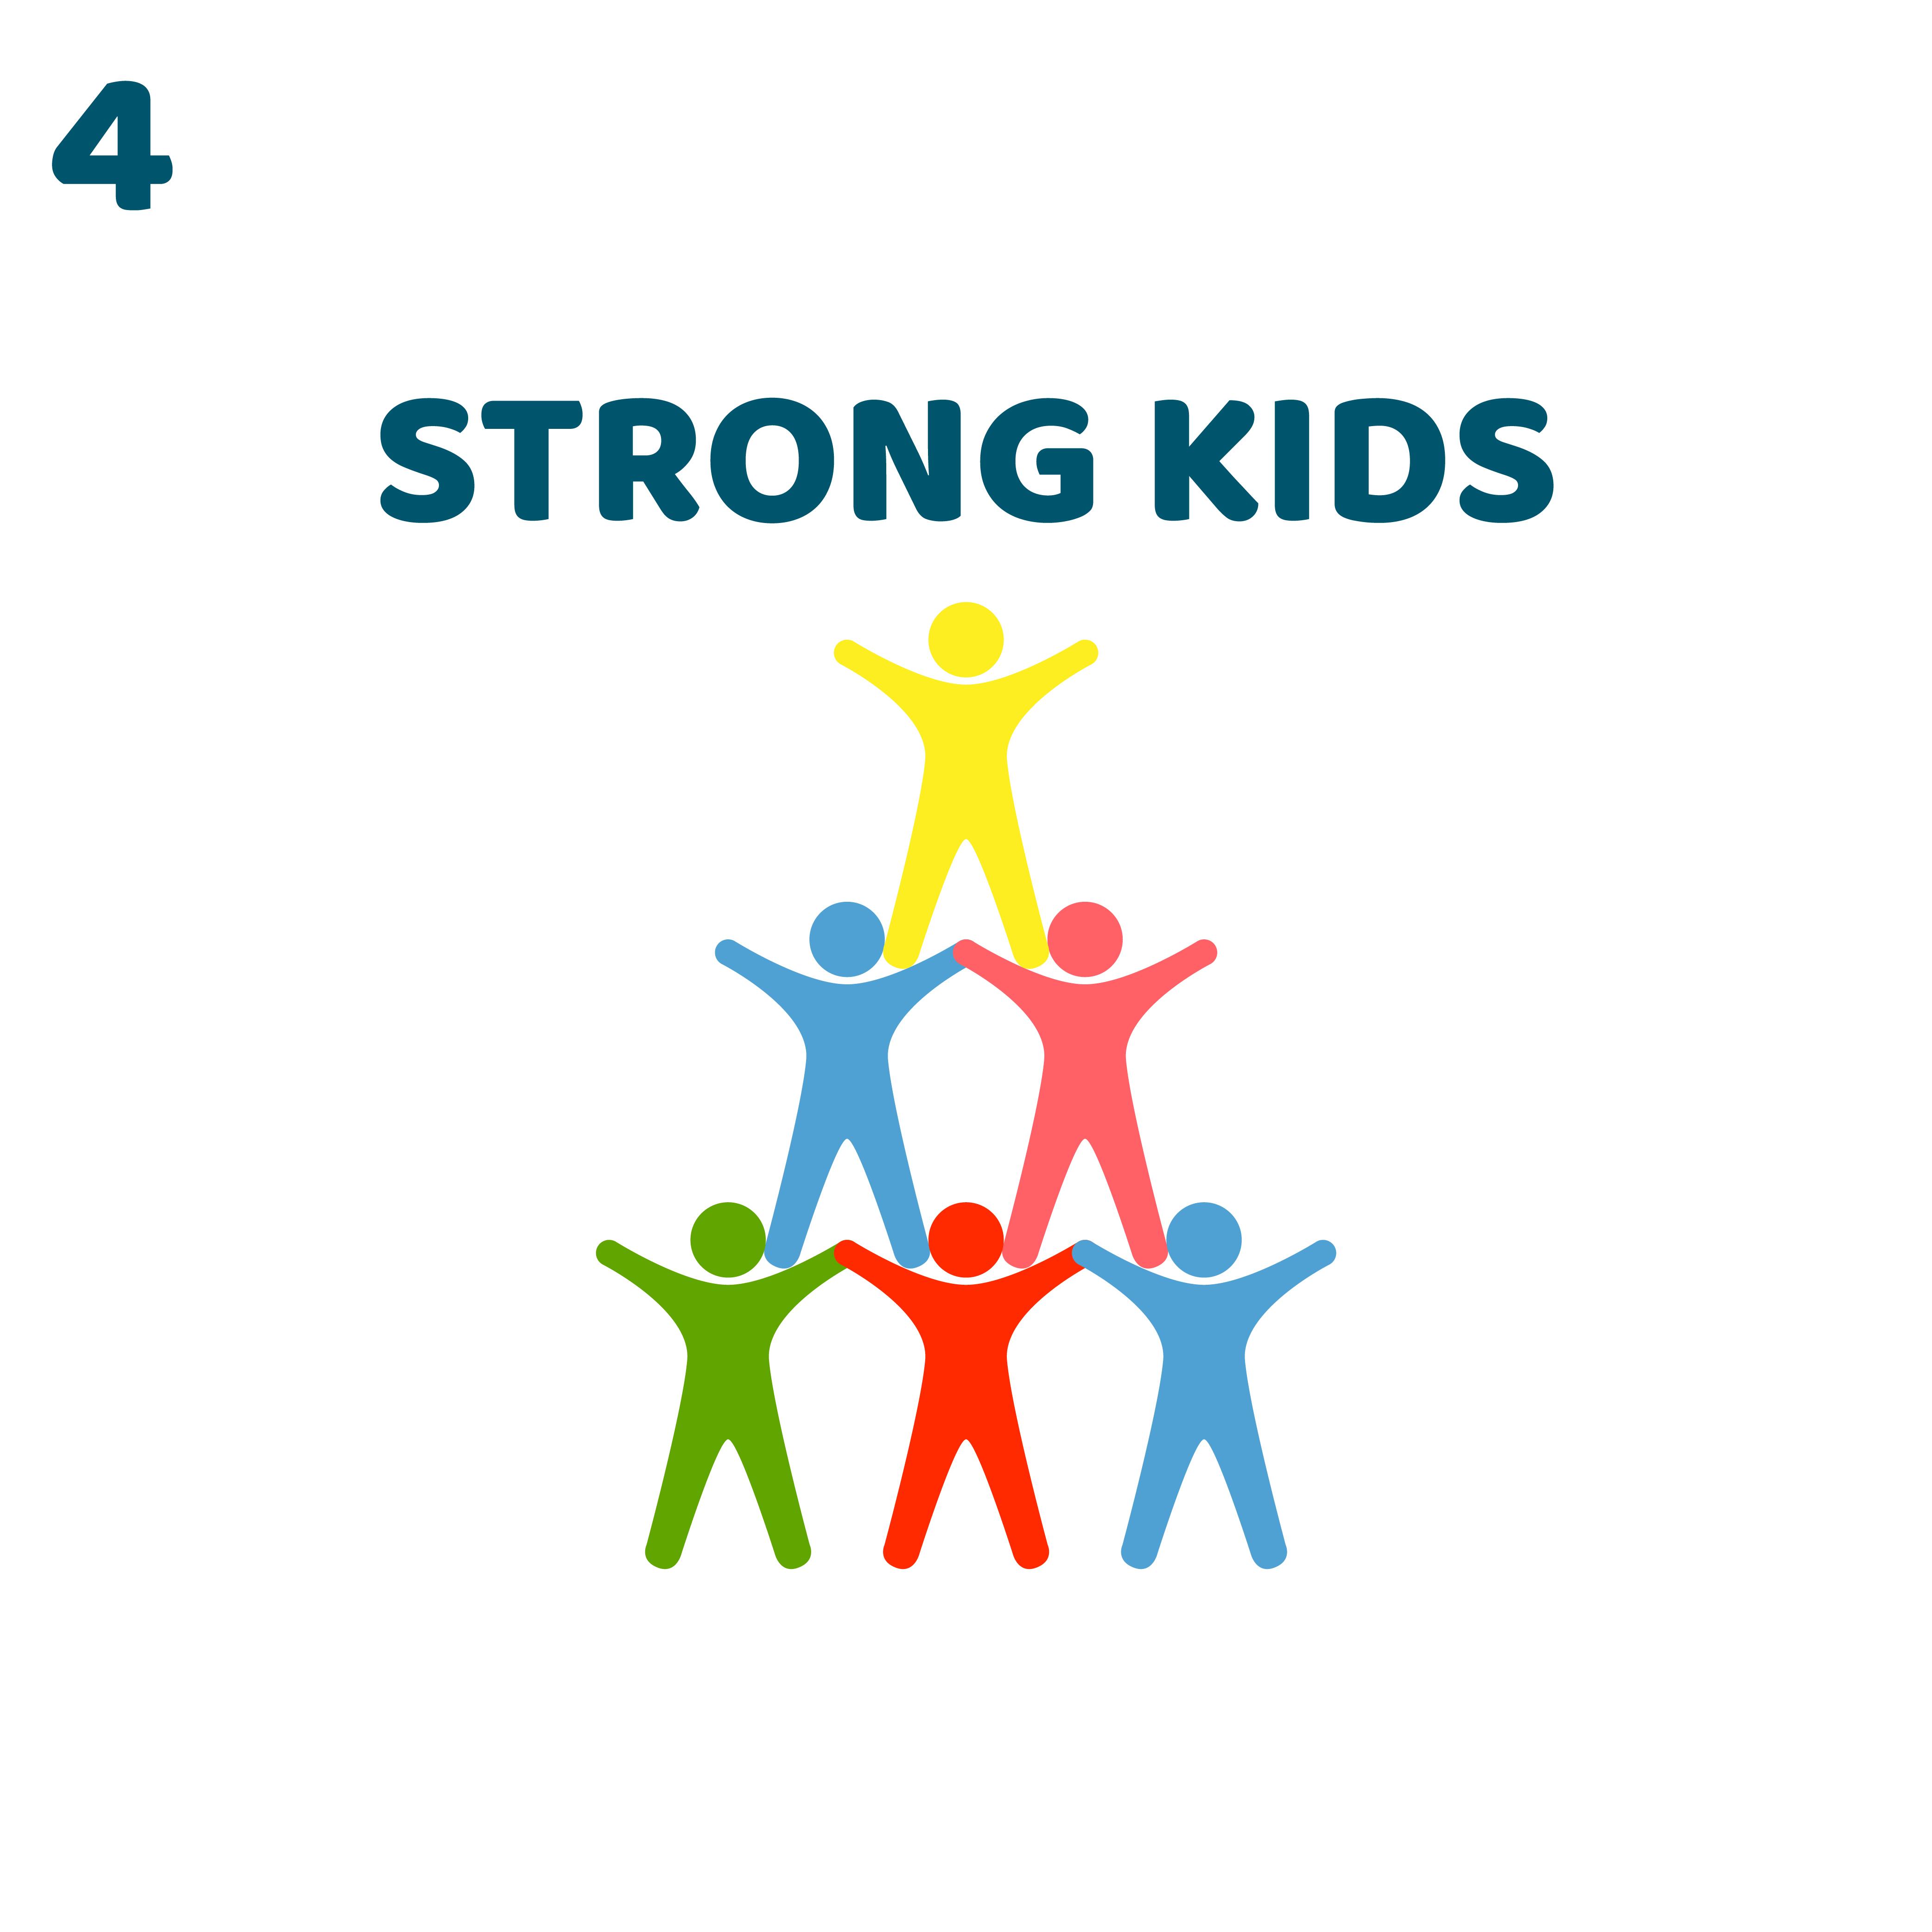 Логотип для Детского Интернет Магазина StrongKids фото f_2805c7002e1eb39c.jpg